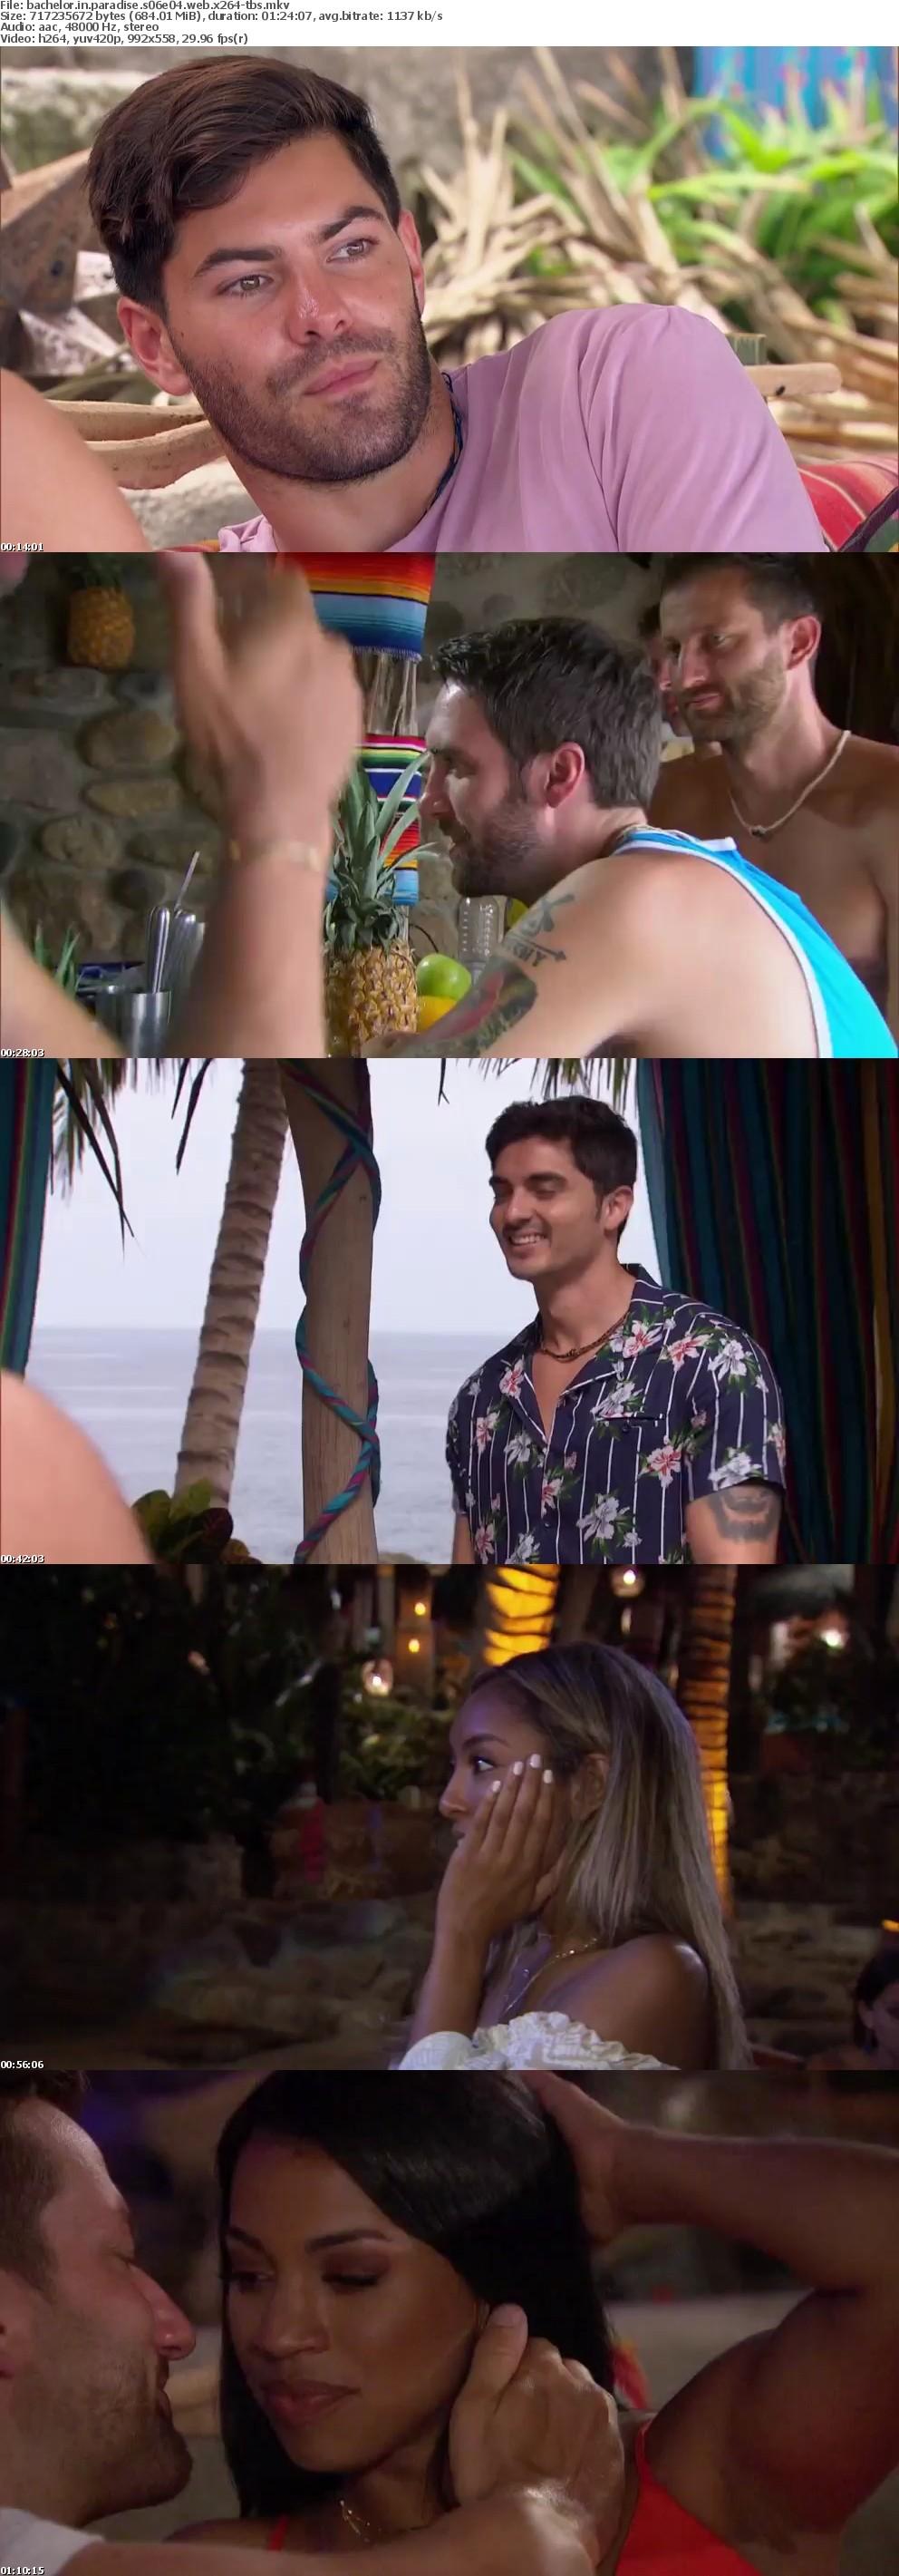 Bachelor In Paradise S06E04 WEB x264-TBS